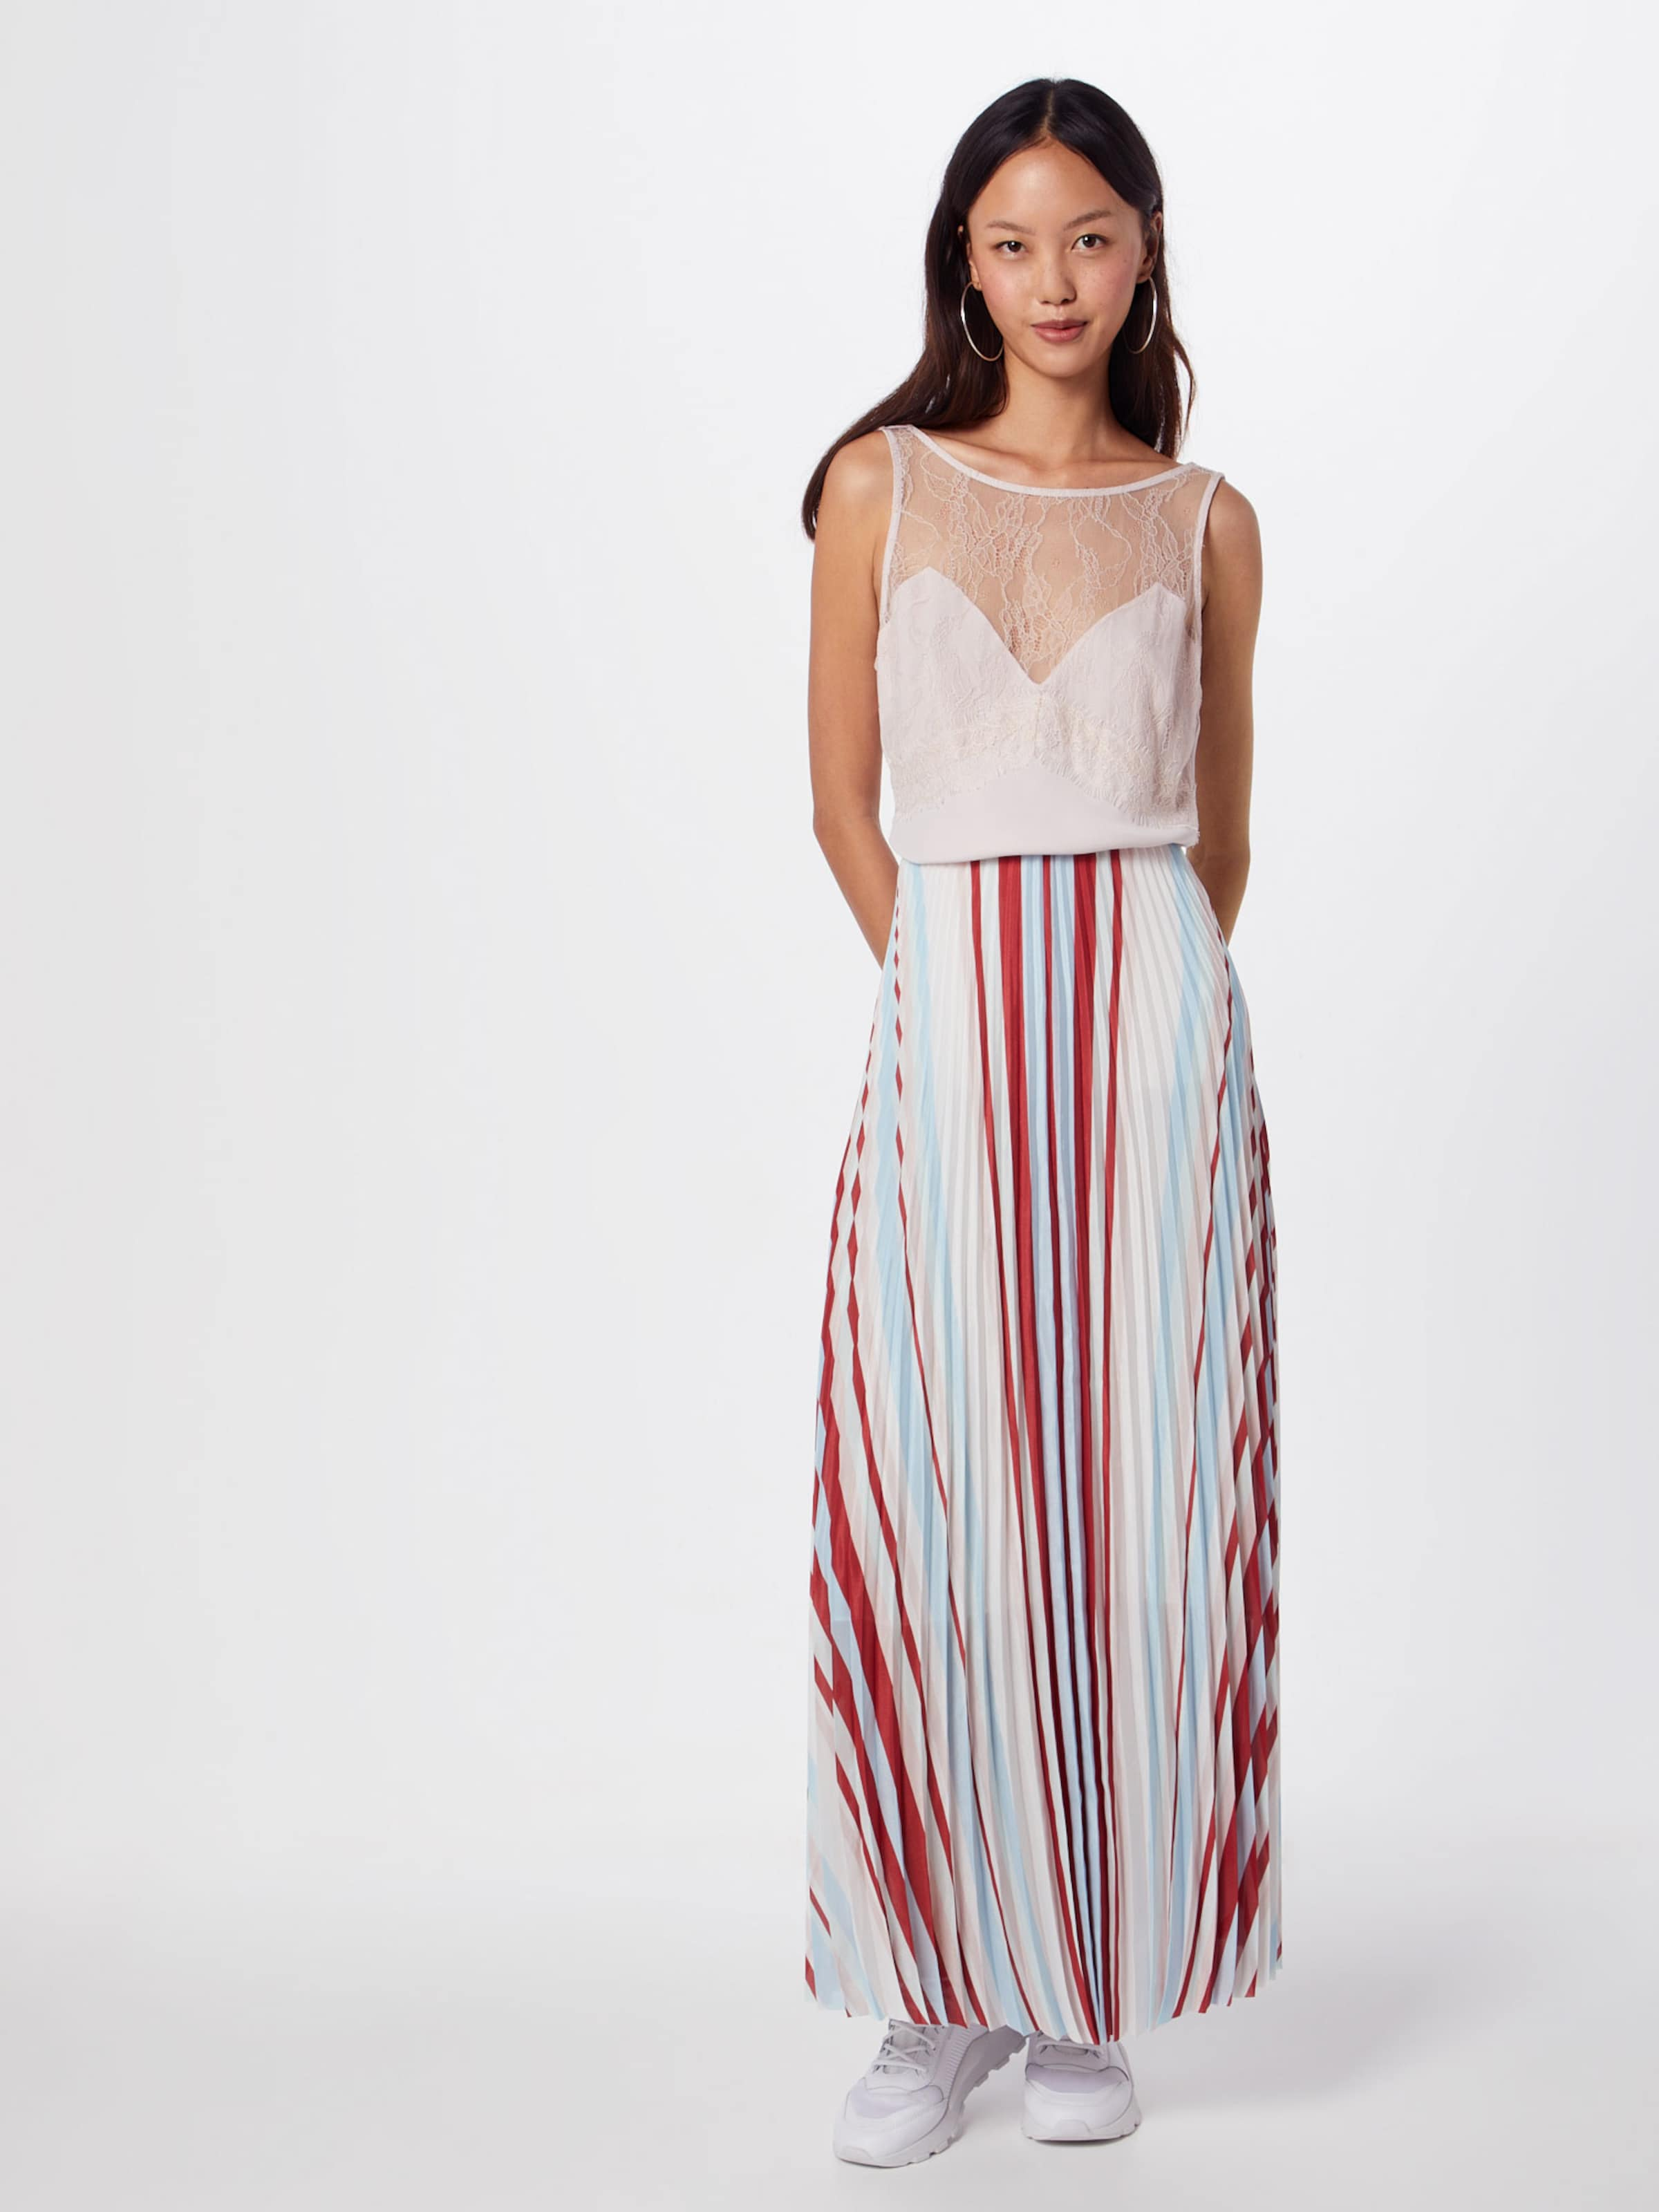 9941' Shirt 'cornelia Samsoeamp; Rosa Top In IH29ED